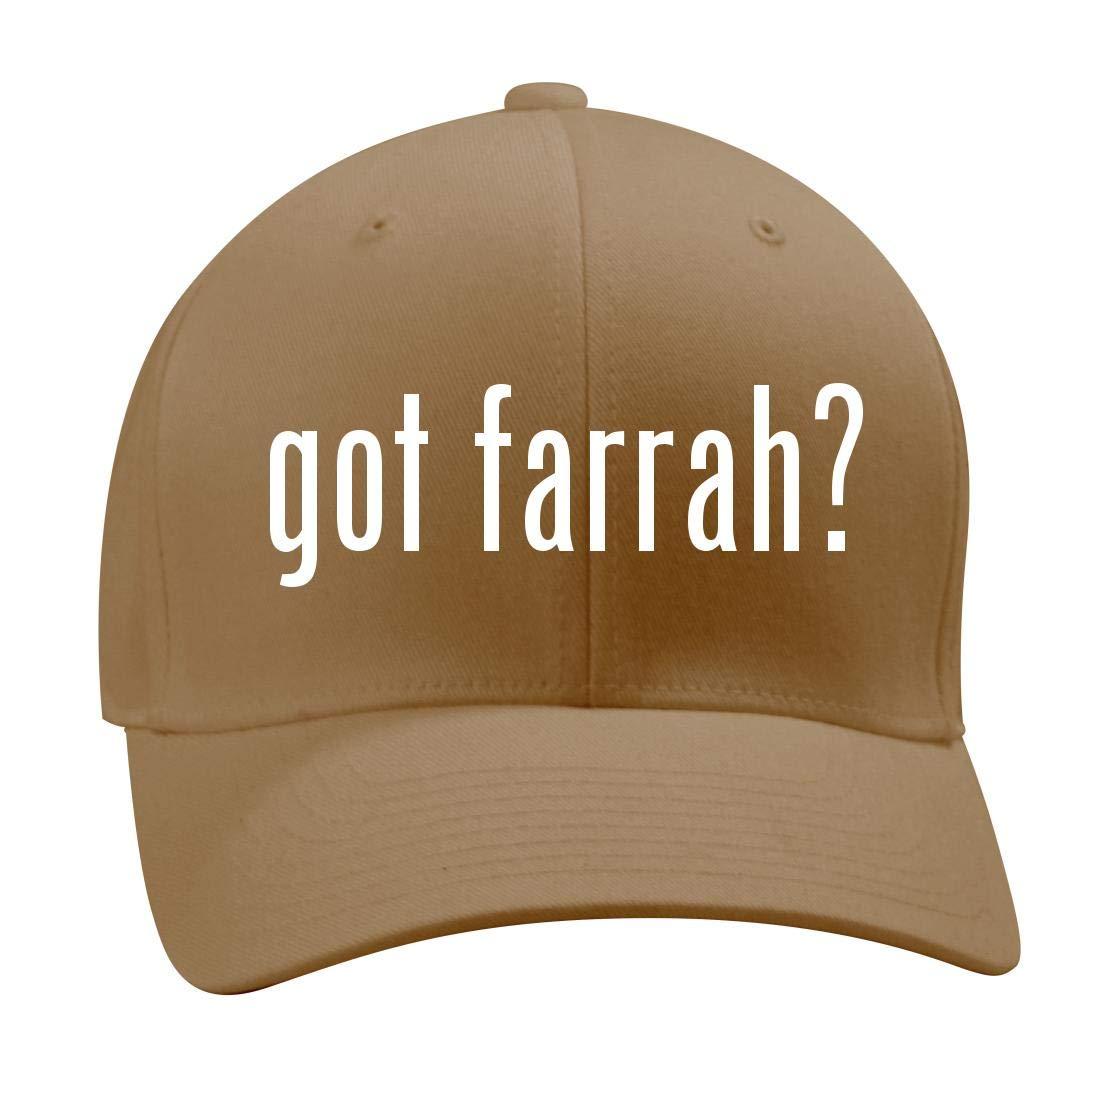 7f4fb43c47316 Amazon.com: got Farrah? - A Nice Men's Adult Baseball Hat Cap: Clothing